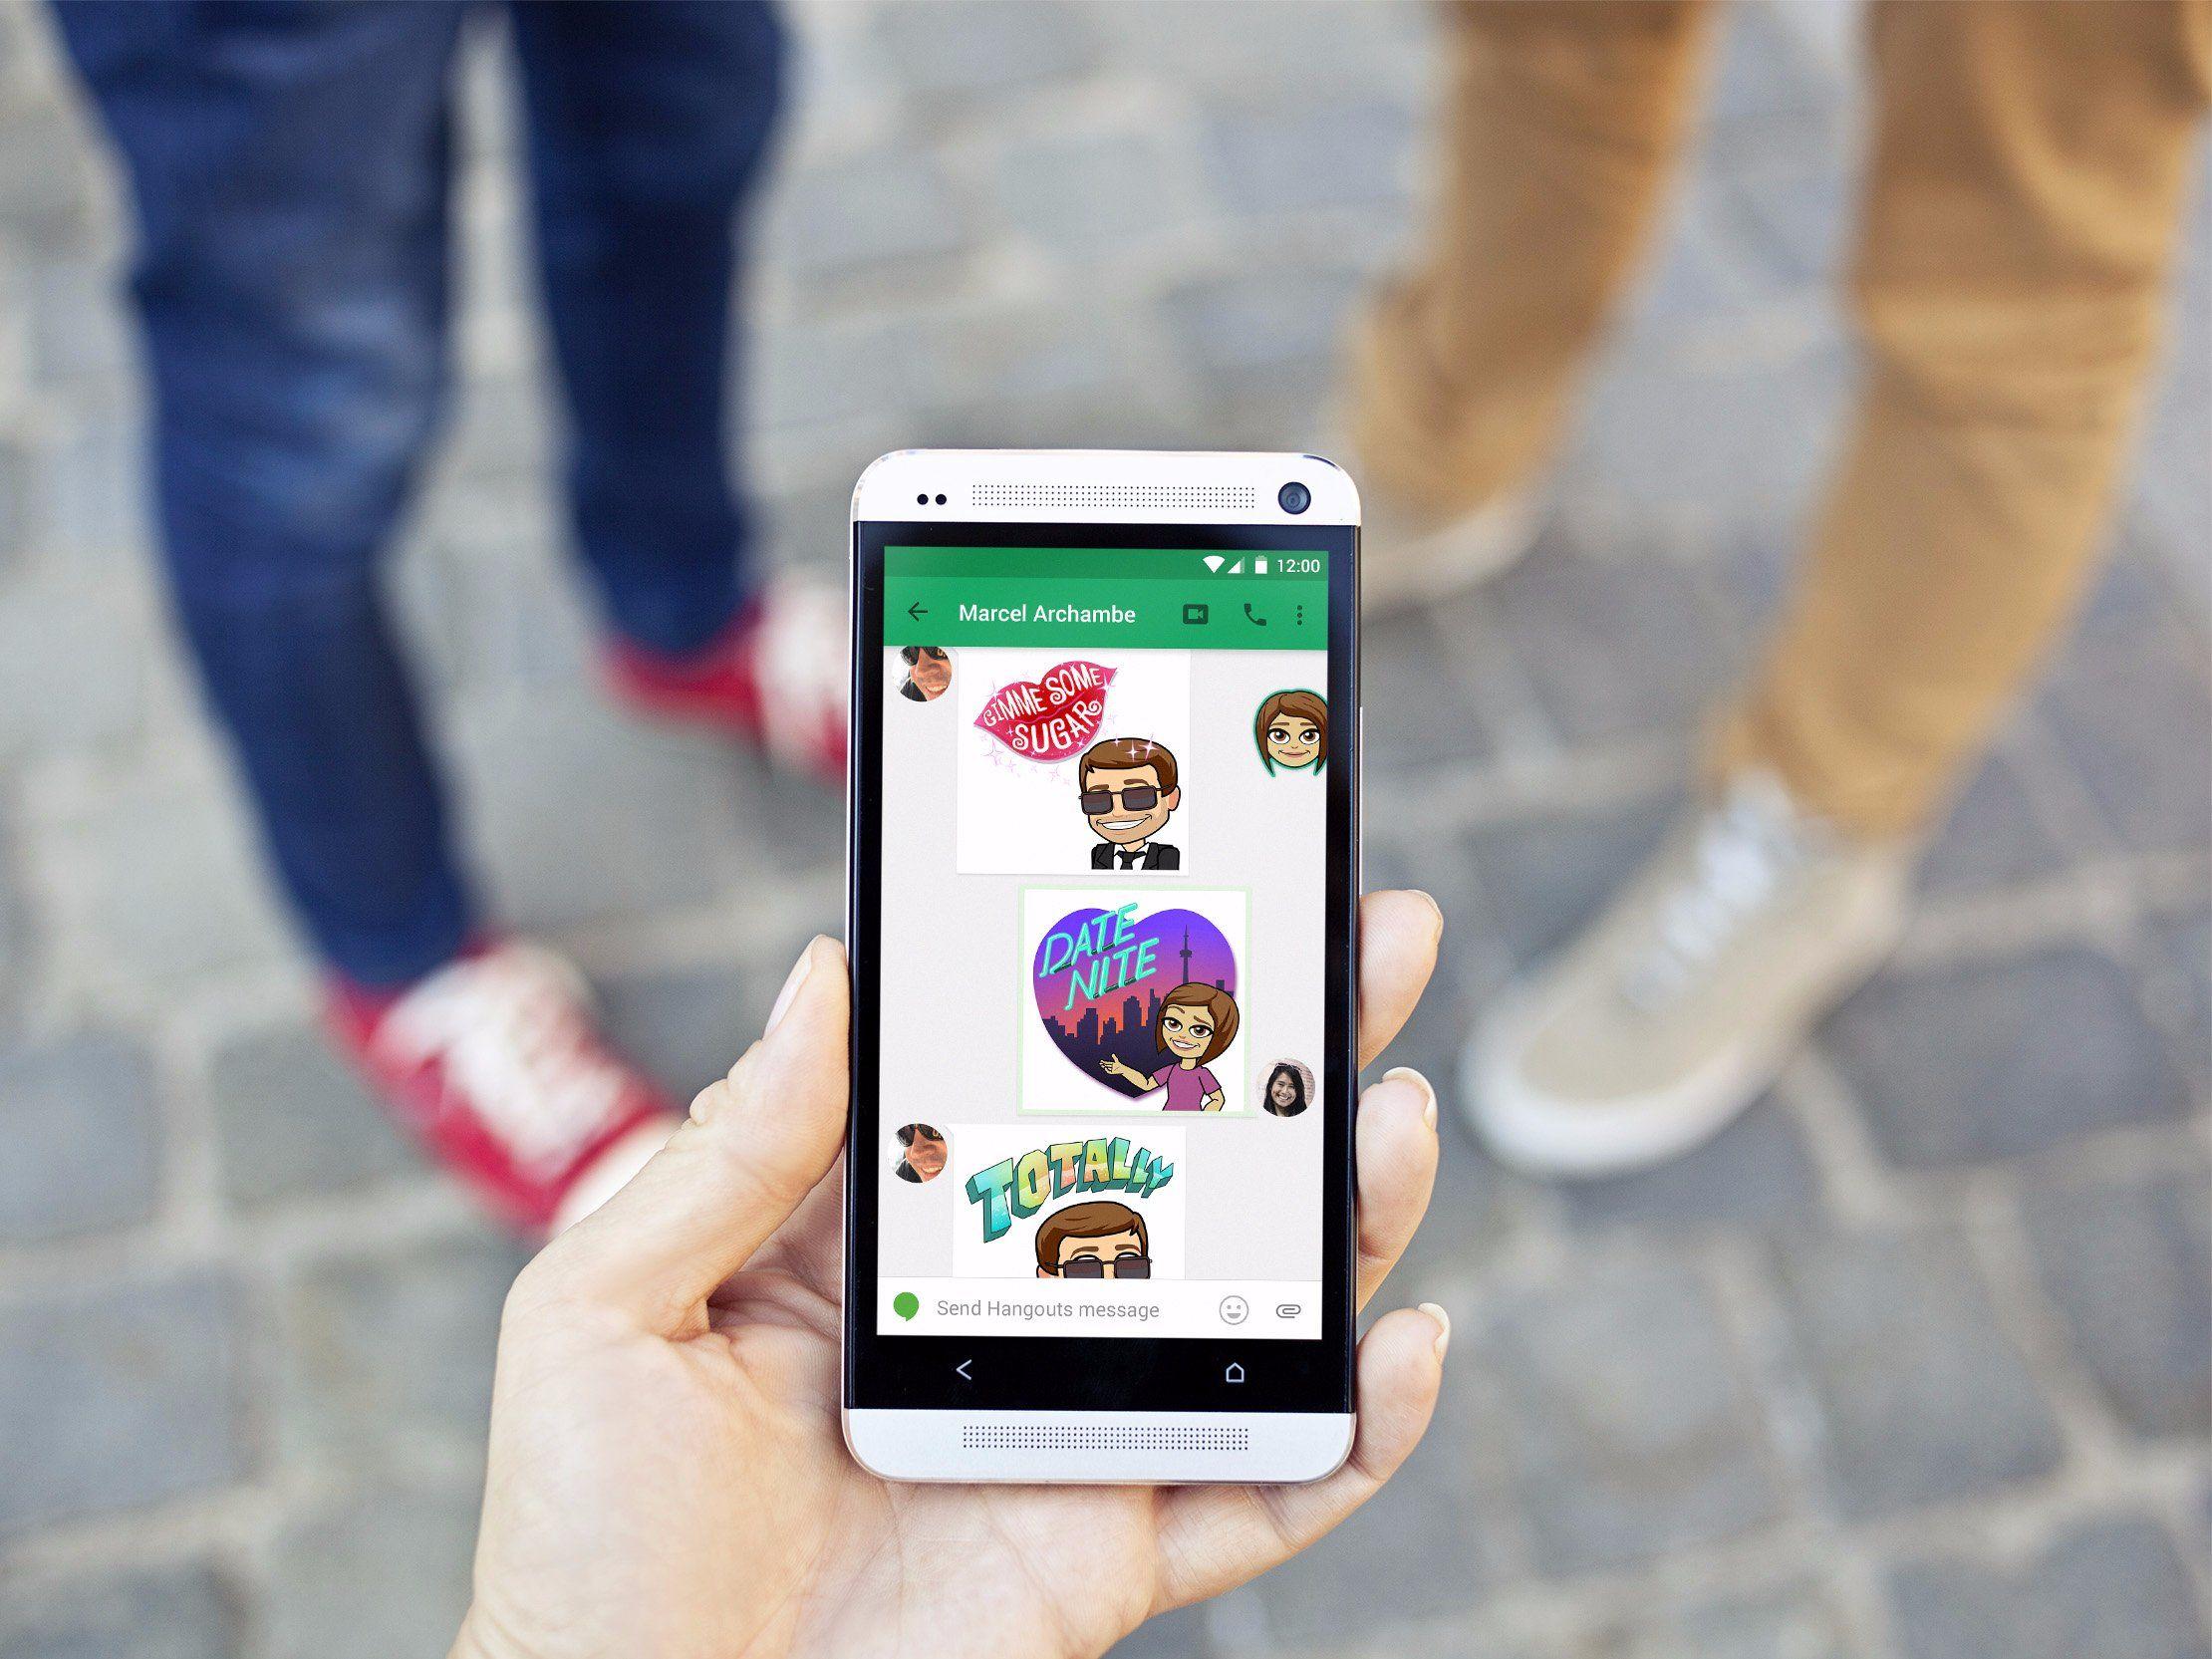 Bitmoji snapchats emoji creator is fastestgrowing app